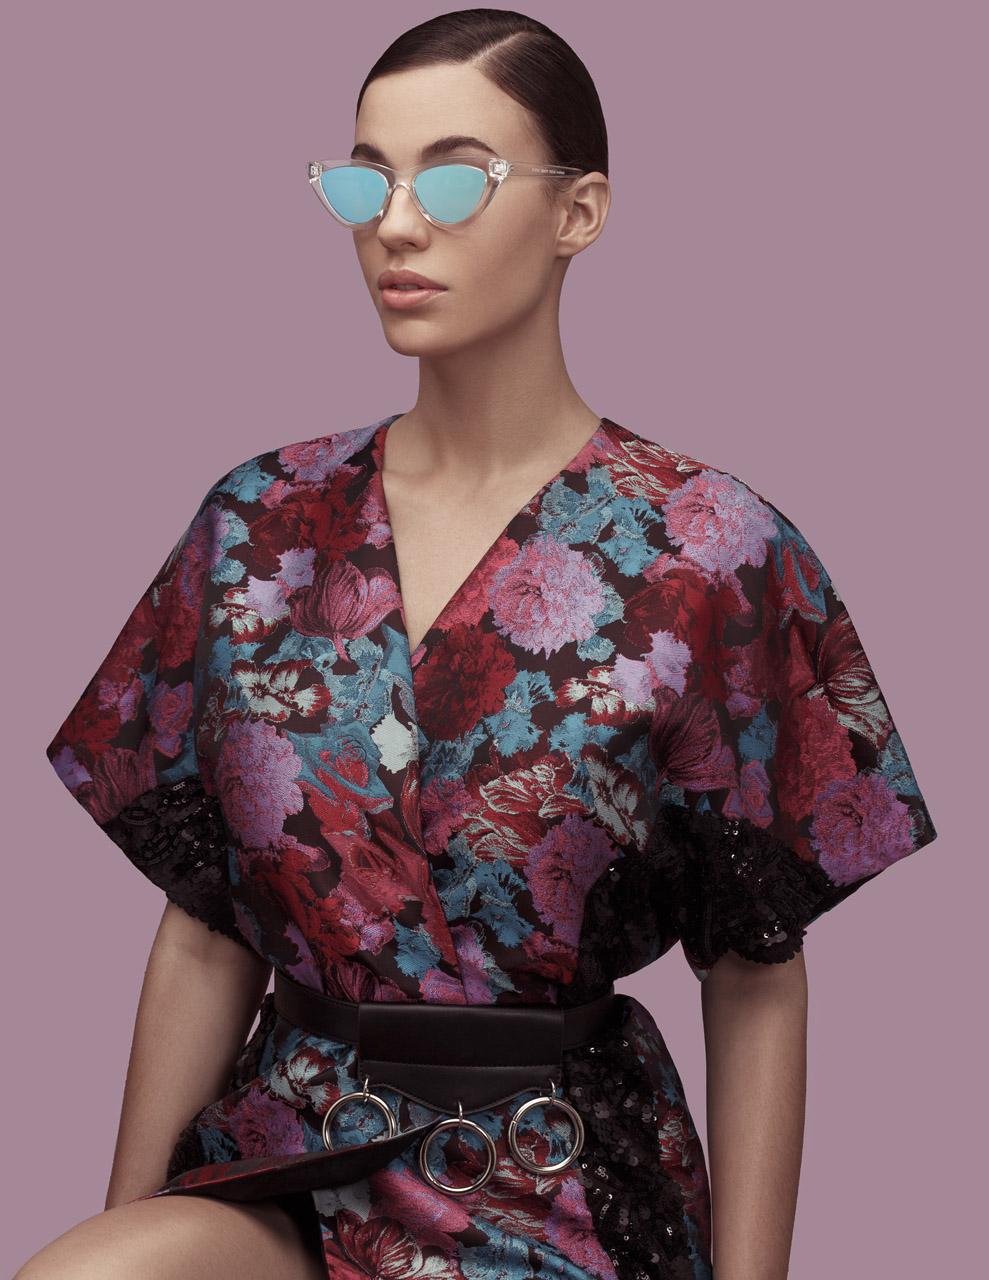 Nadia-Duca-Makeup-Artist-commercial (25).jpg